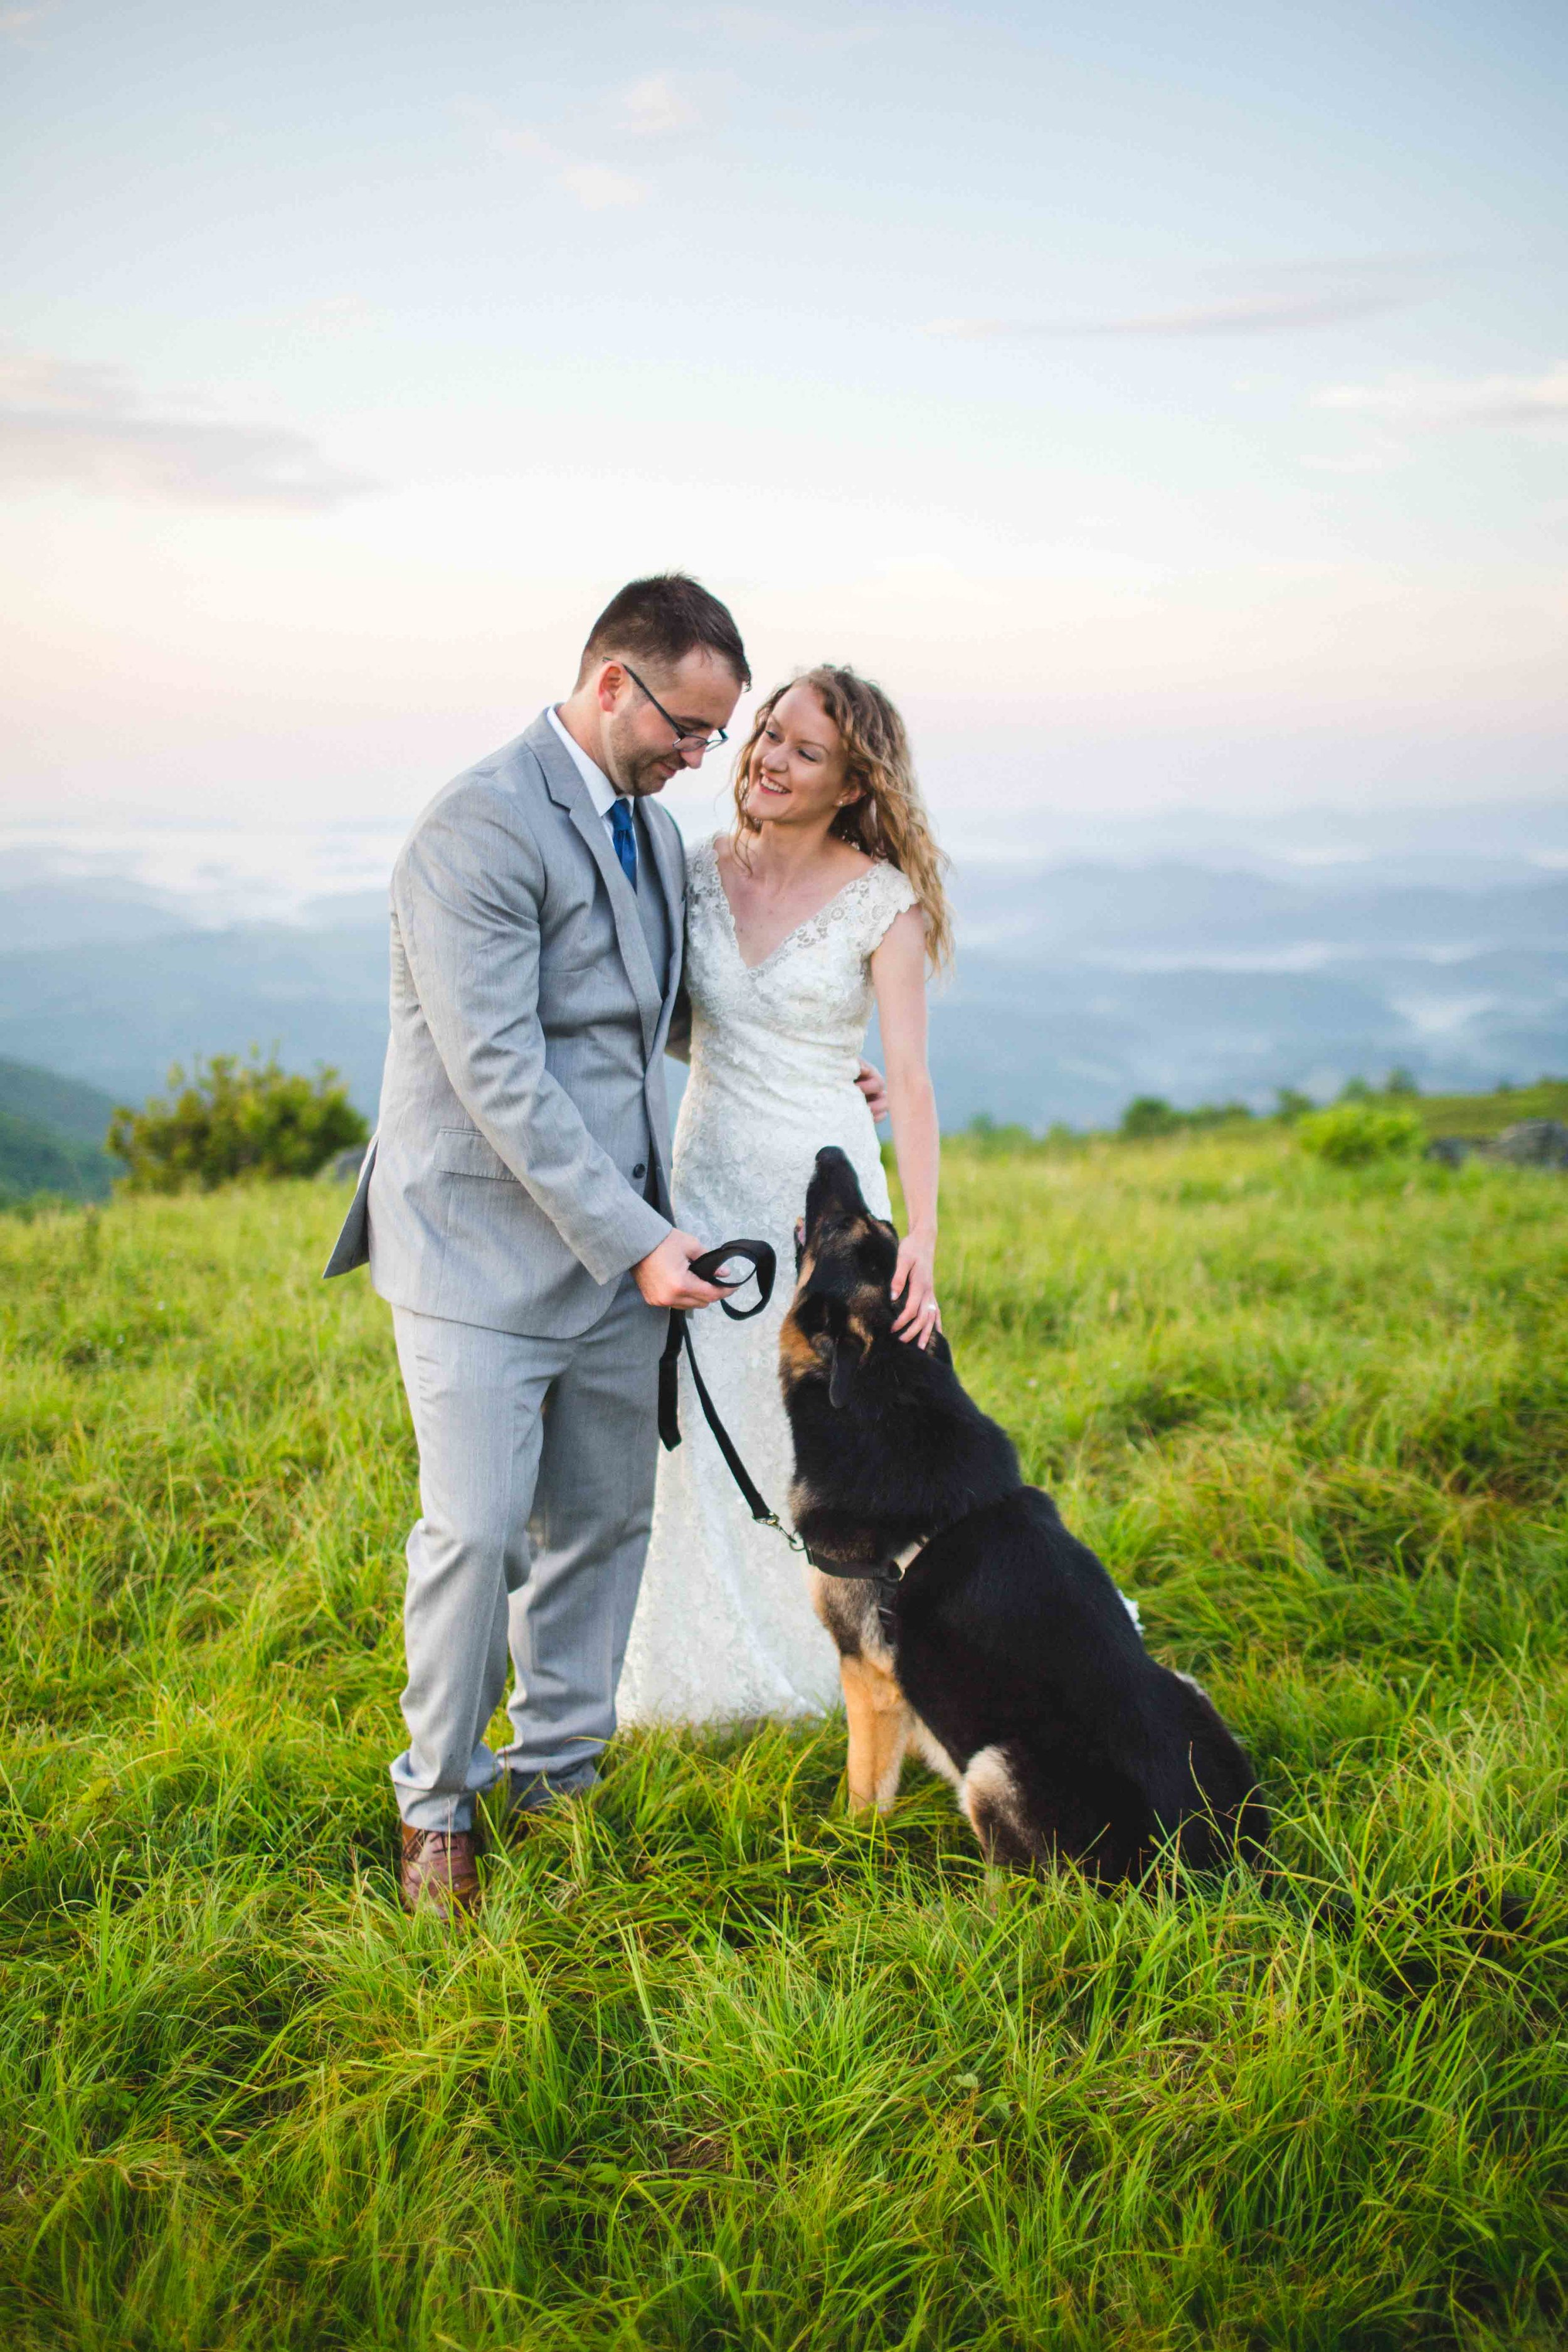 north-carolina-elopement-photographer-42.jpg